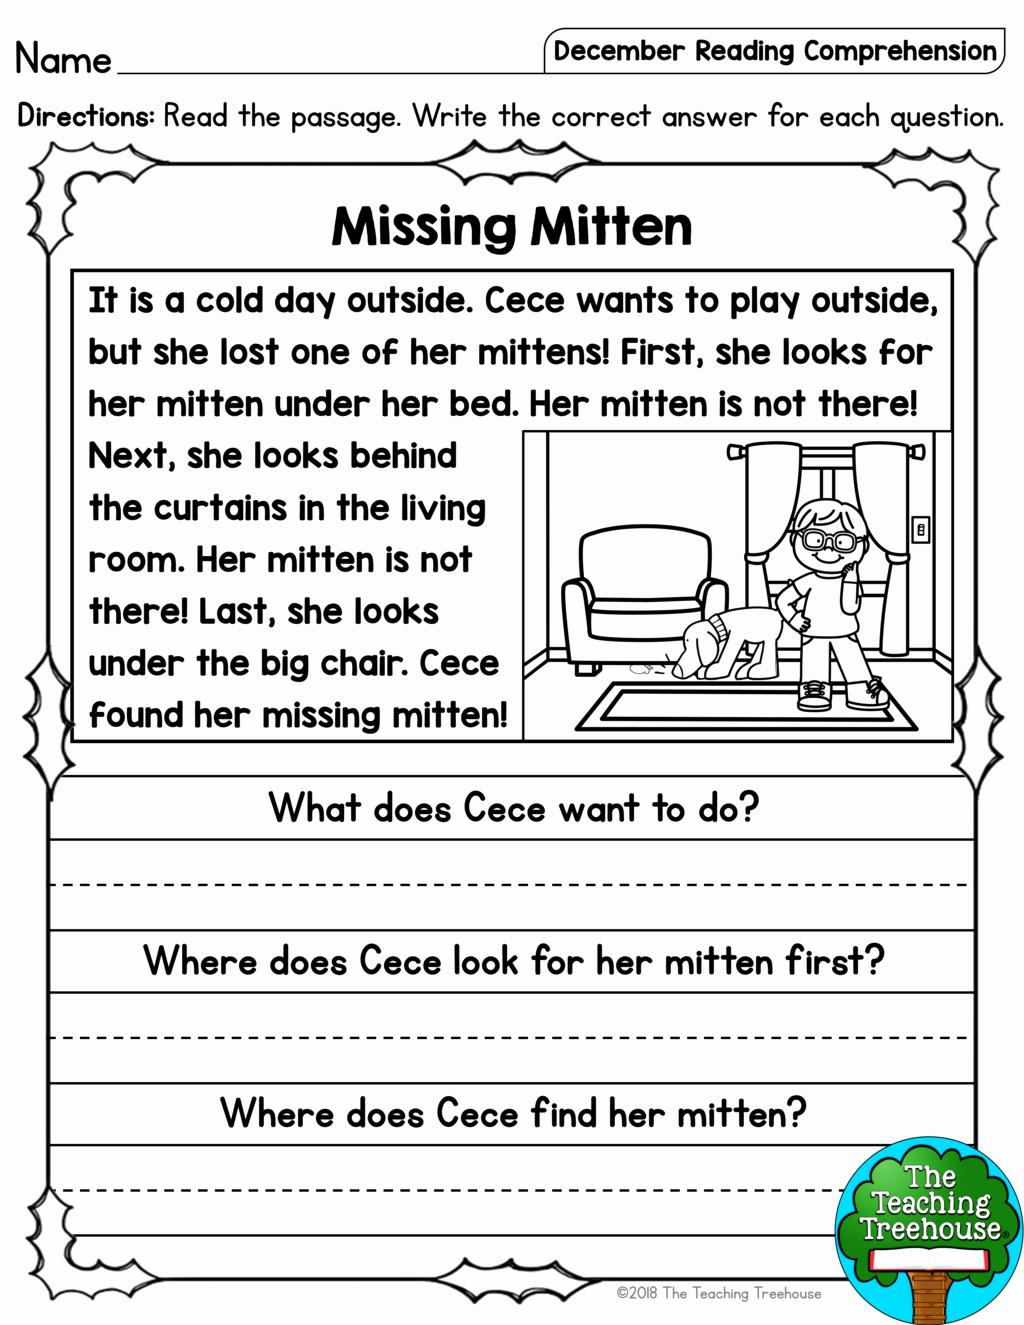 Comprehension Worksheet First Grade Luxury 1st Grade Reading Prehension Worksheets Multiple Choice